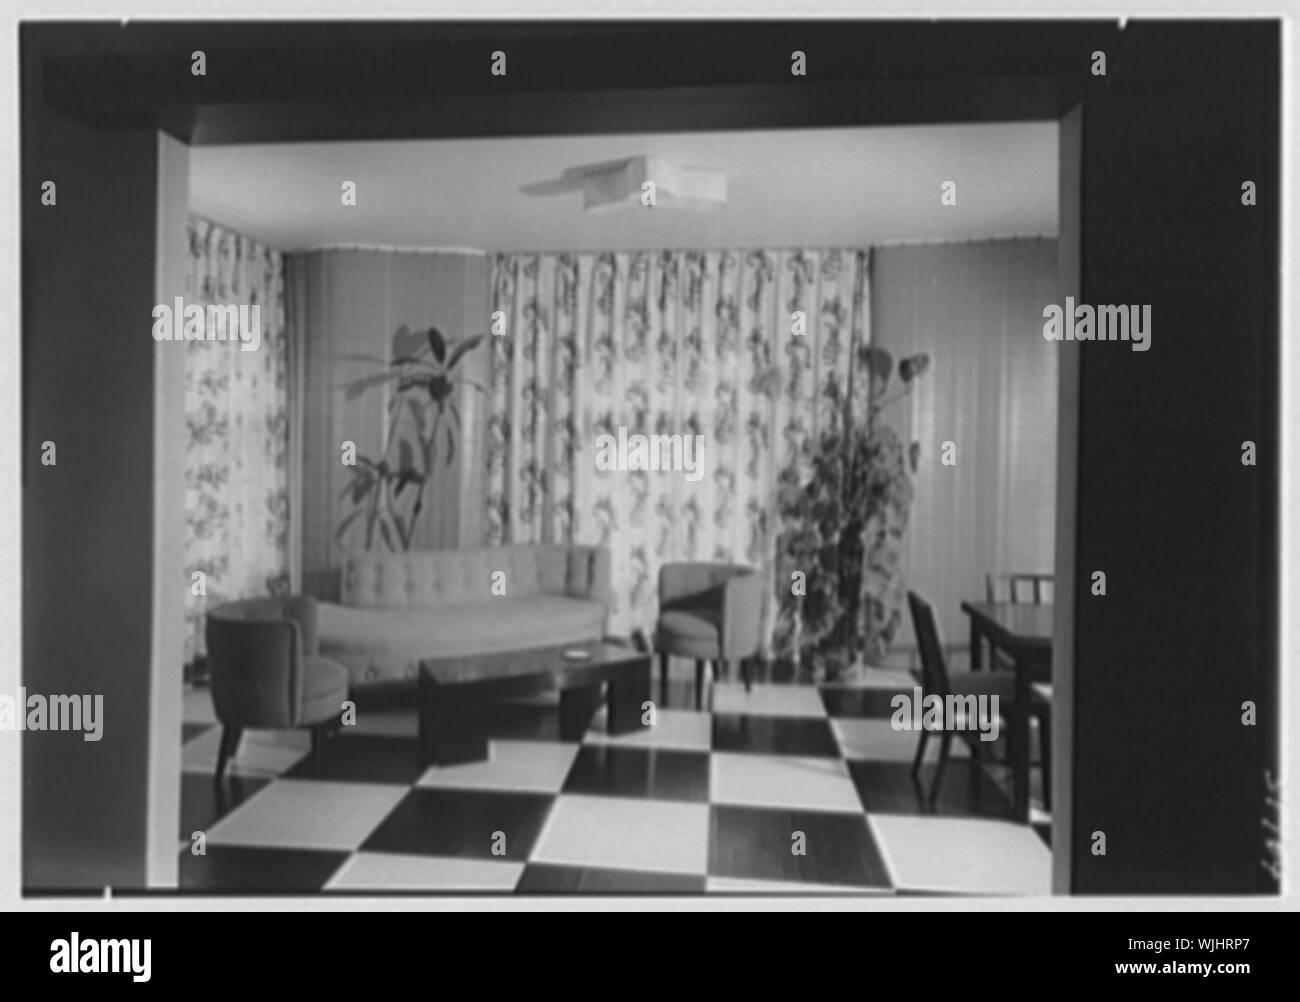 Herman Lowin, residence at 205 Townsend Ave., Pelham Manor, New York. - Stock Photo